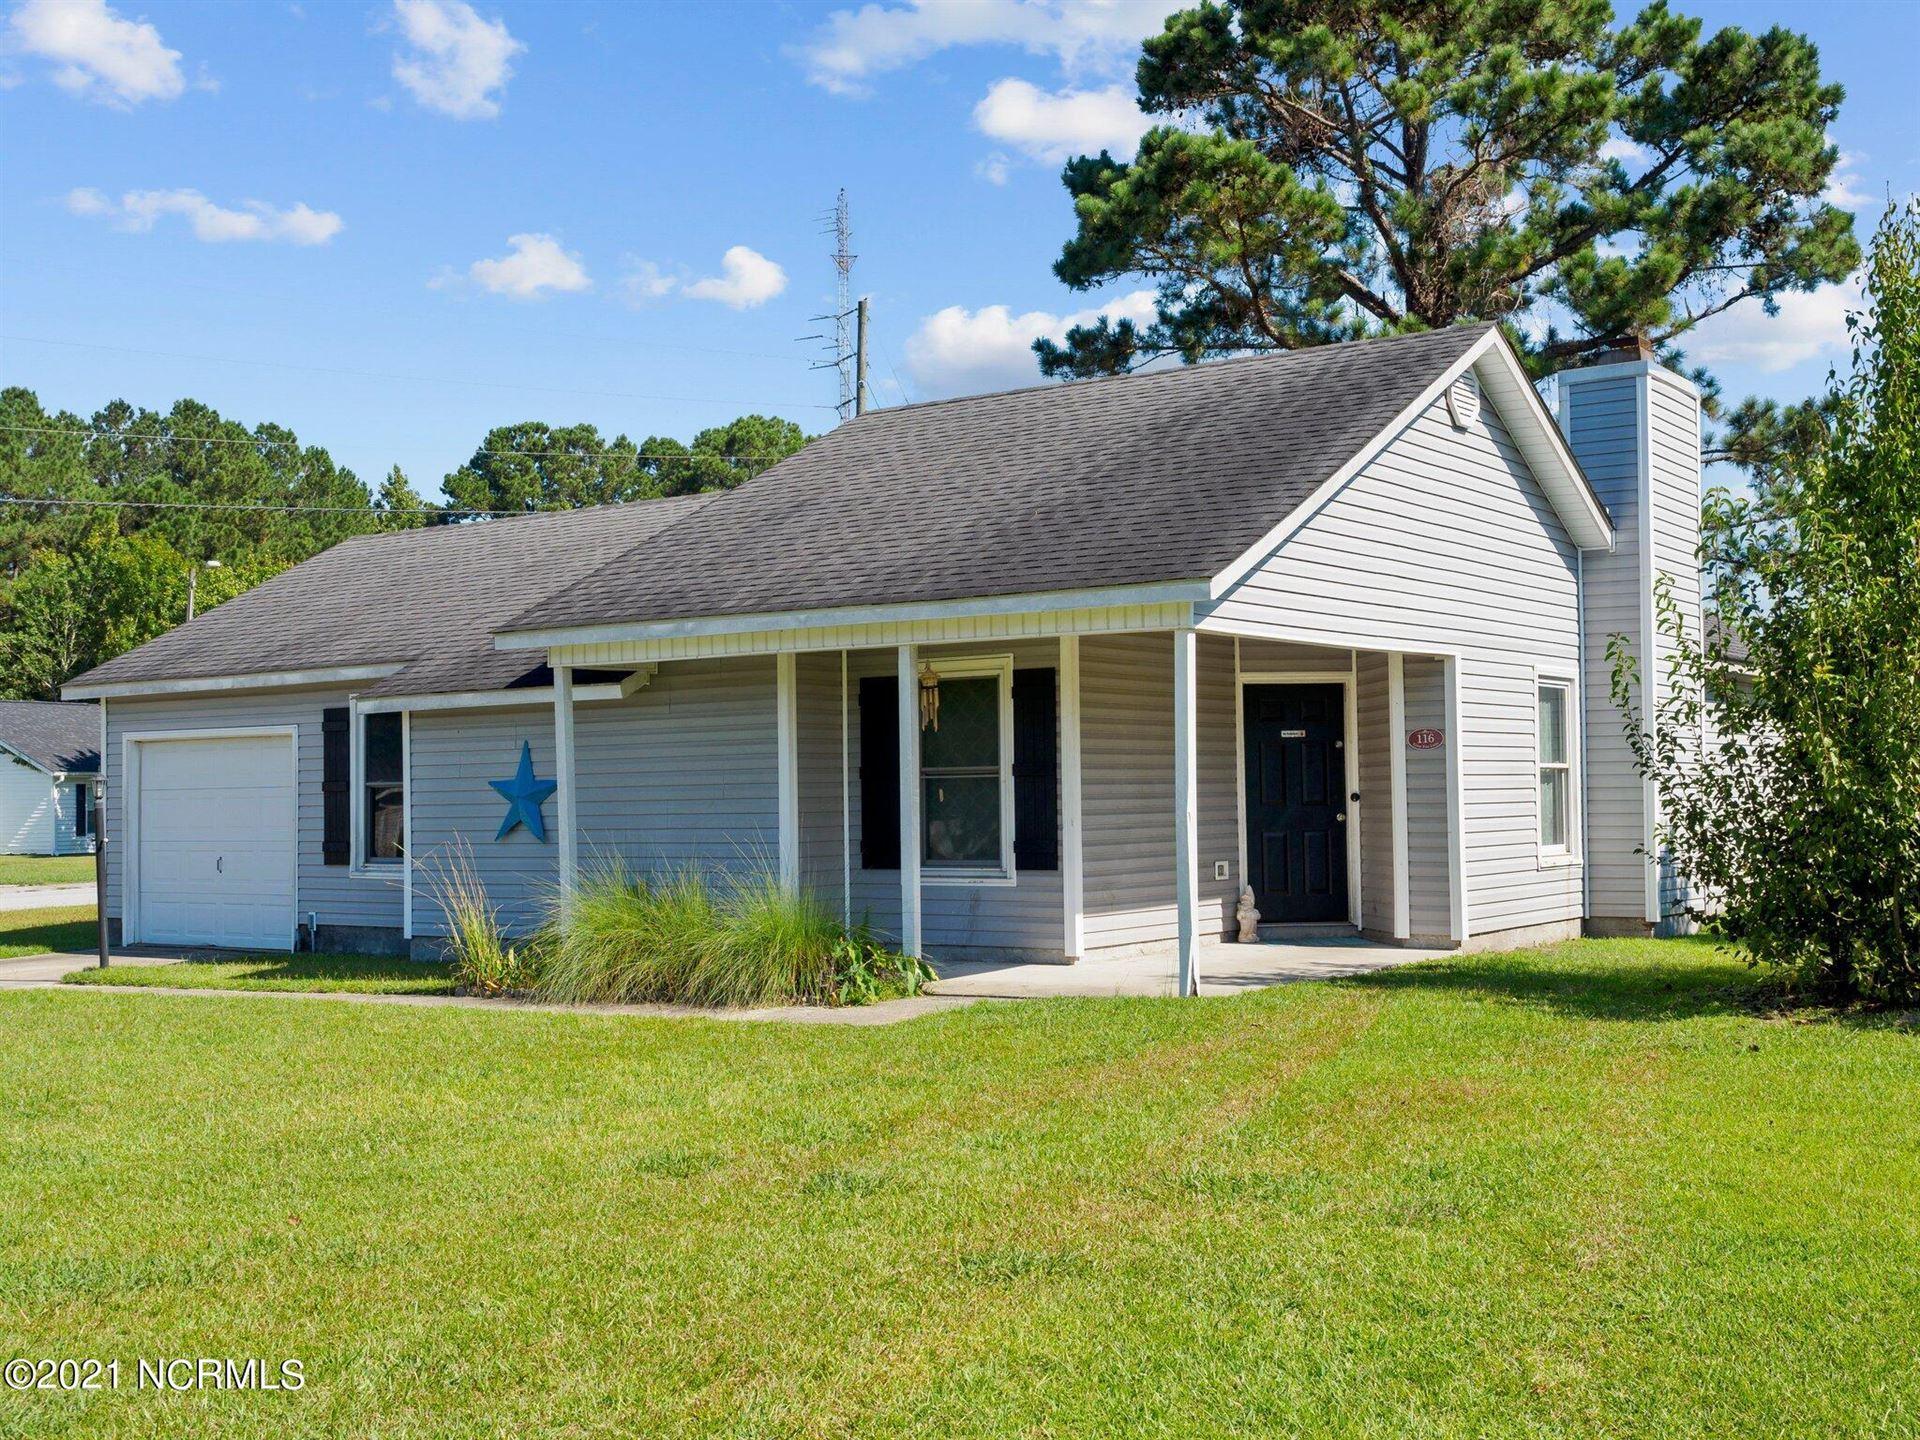 Photo of 116 Grey Fox Lane, Jacksonville, NC 28546 (MLS # 100293153)